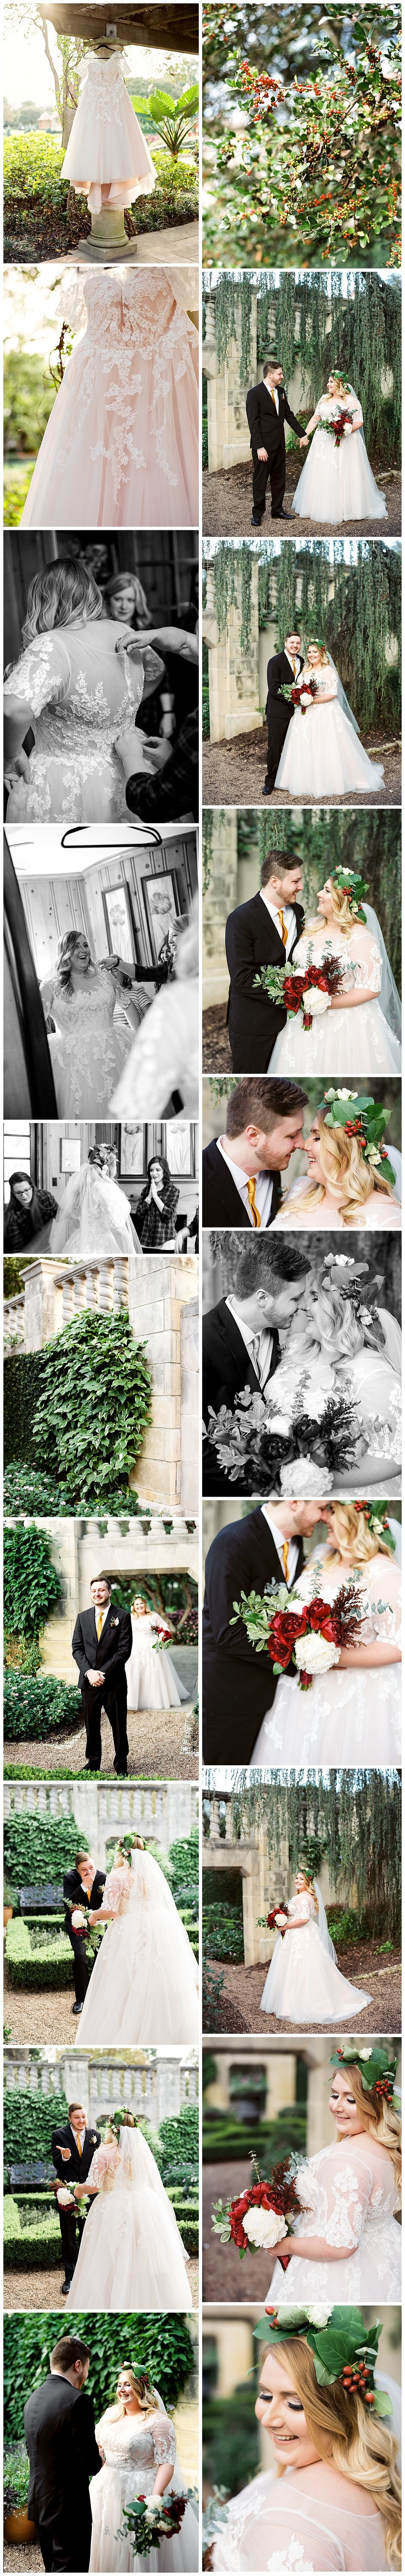 dallas-arboretum-and-botanical-garden-wedding-ar-photography-2.jpg